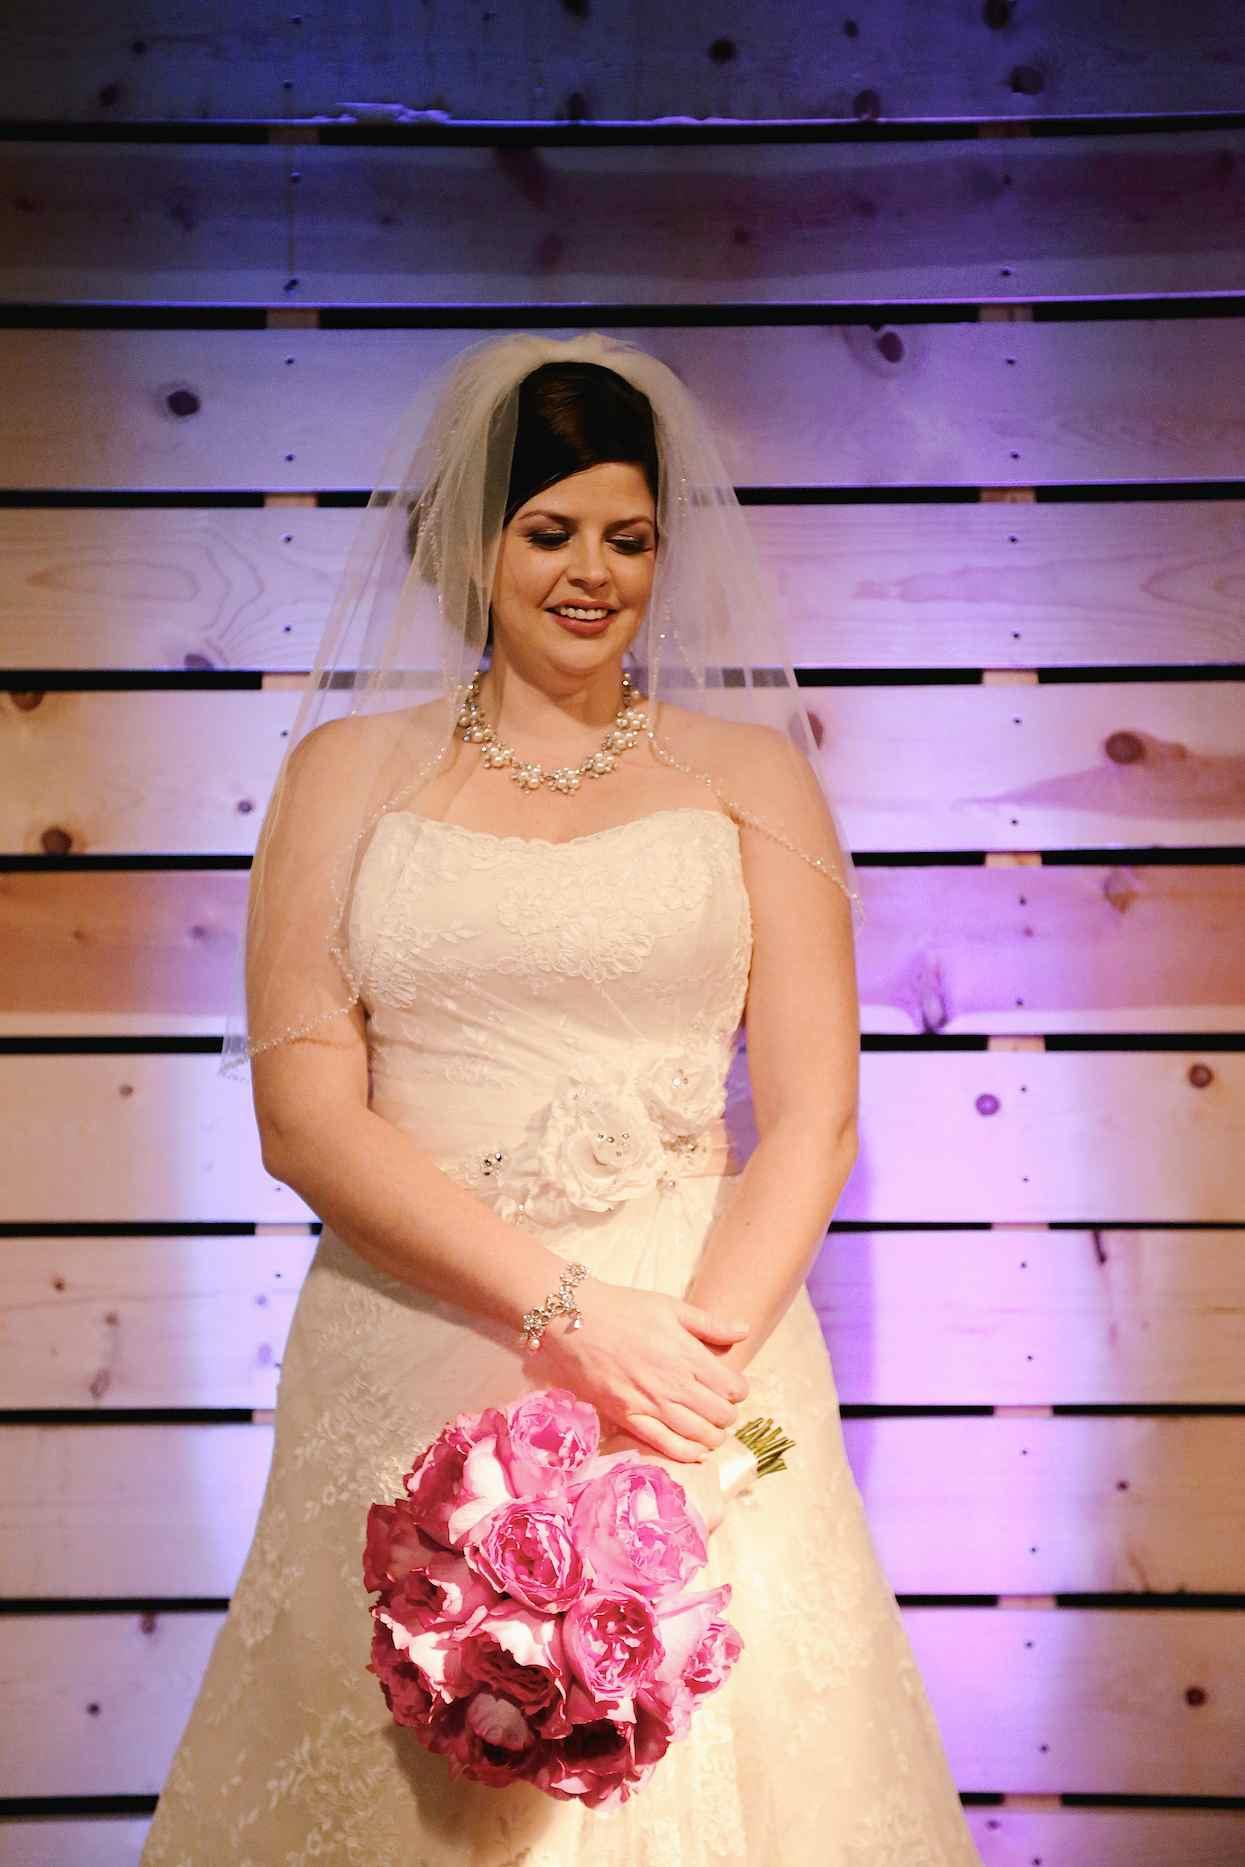 top-10-bride-photos-2013-002